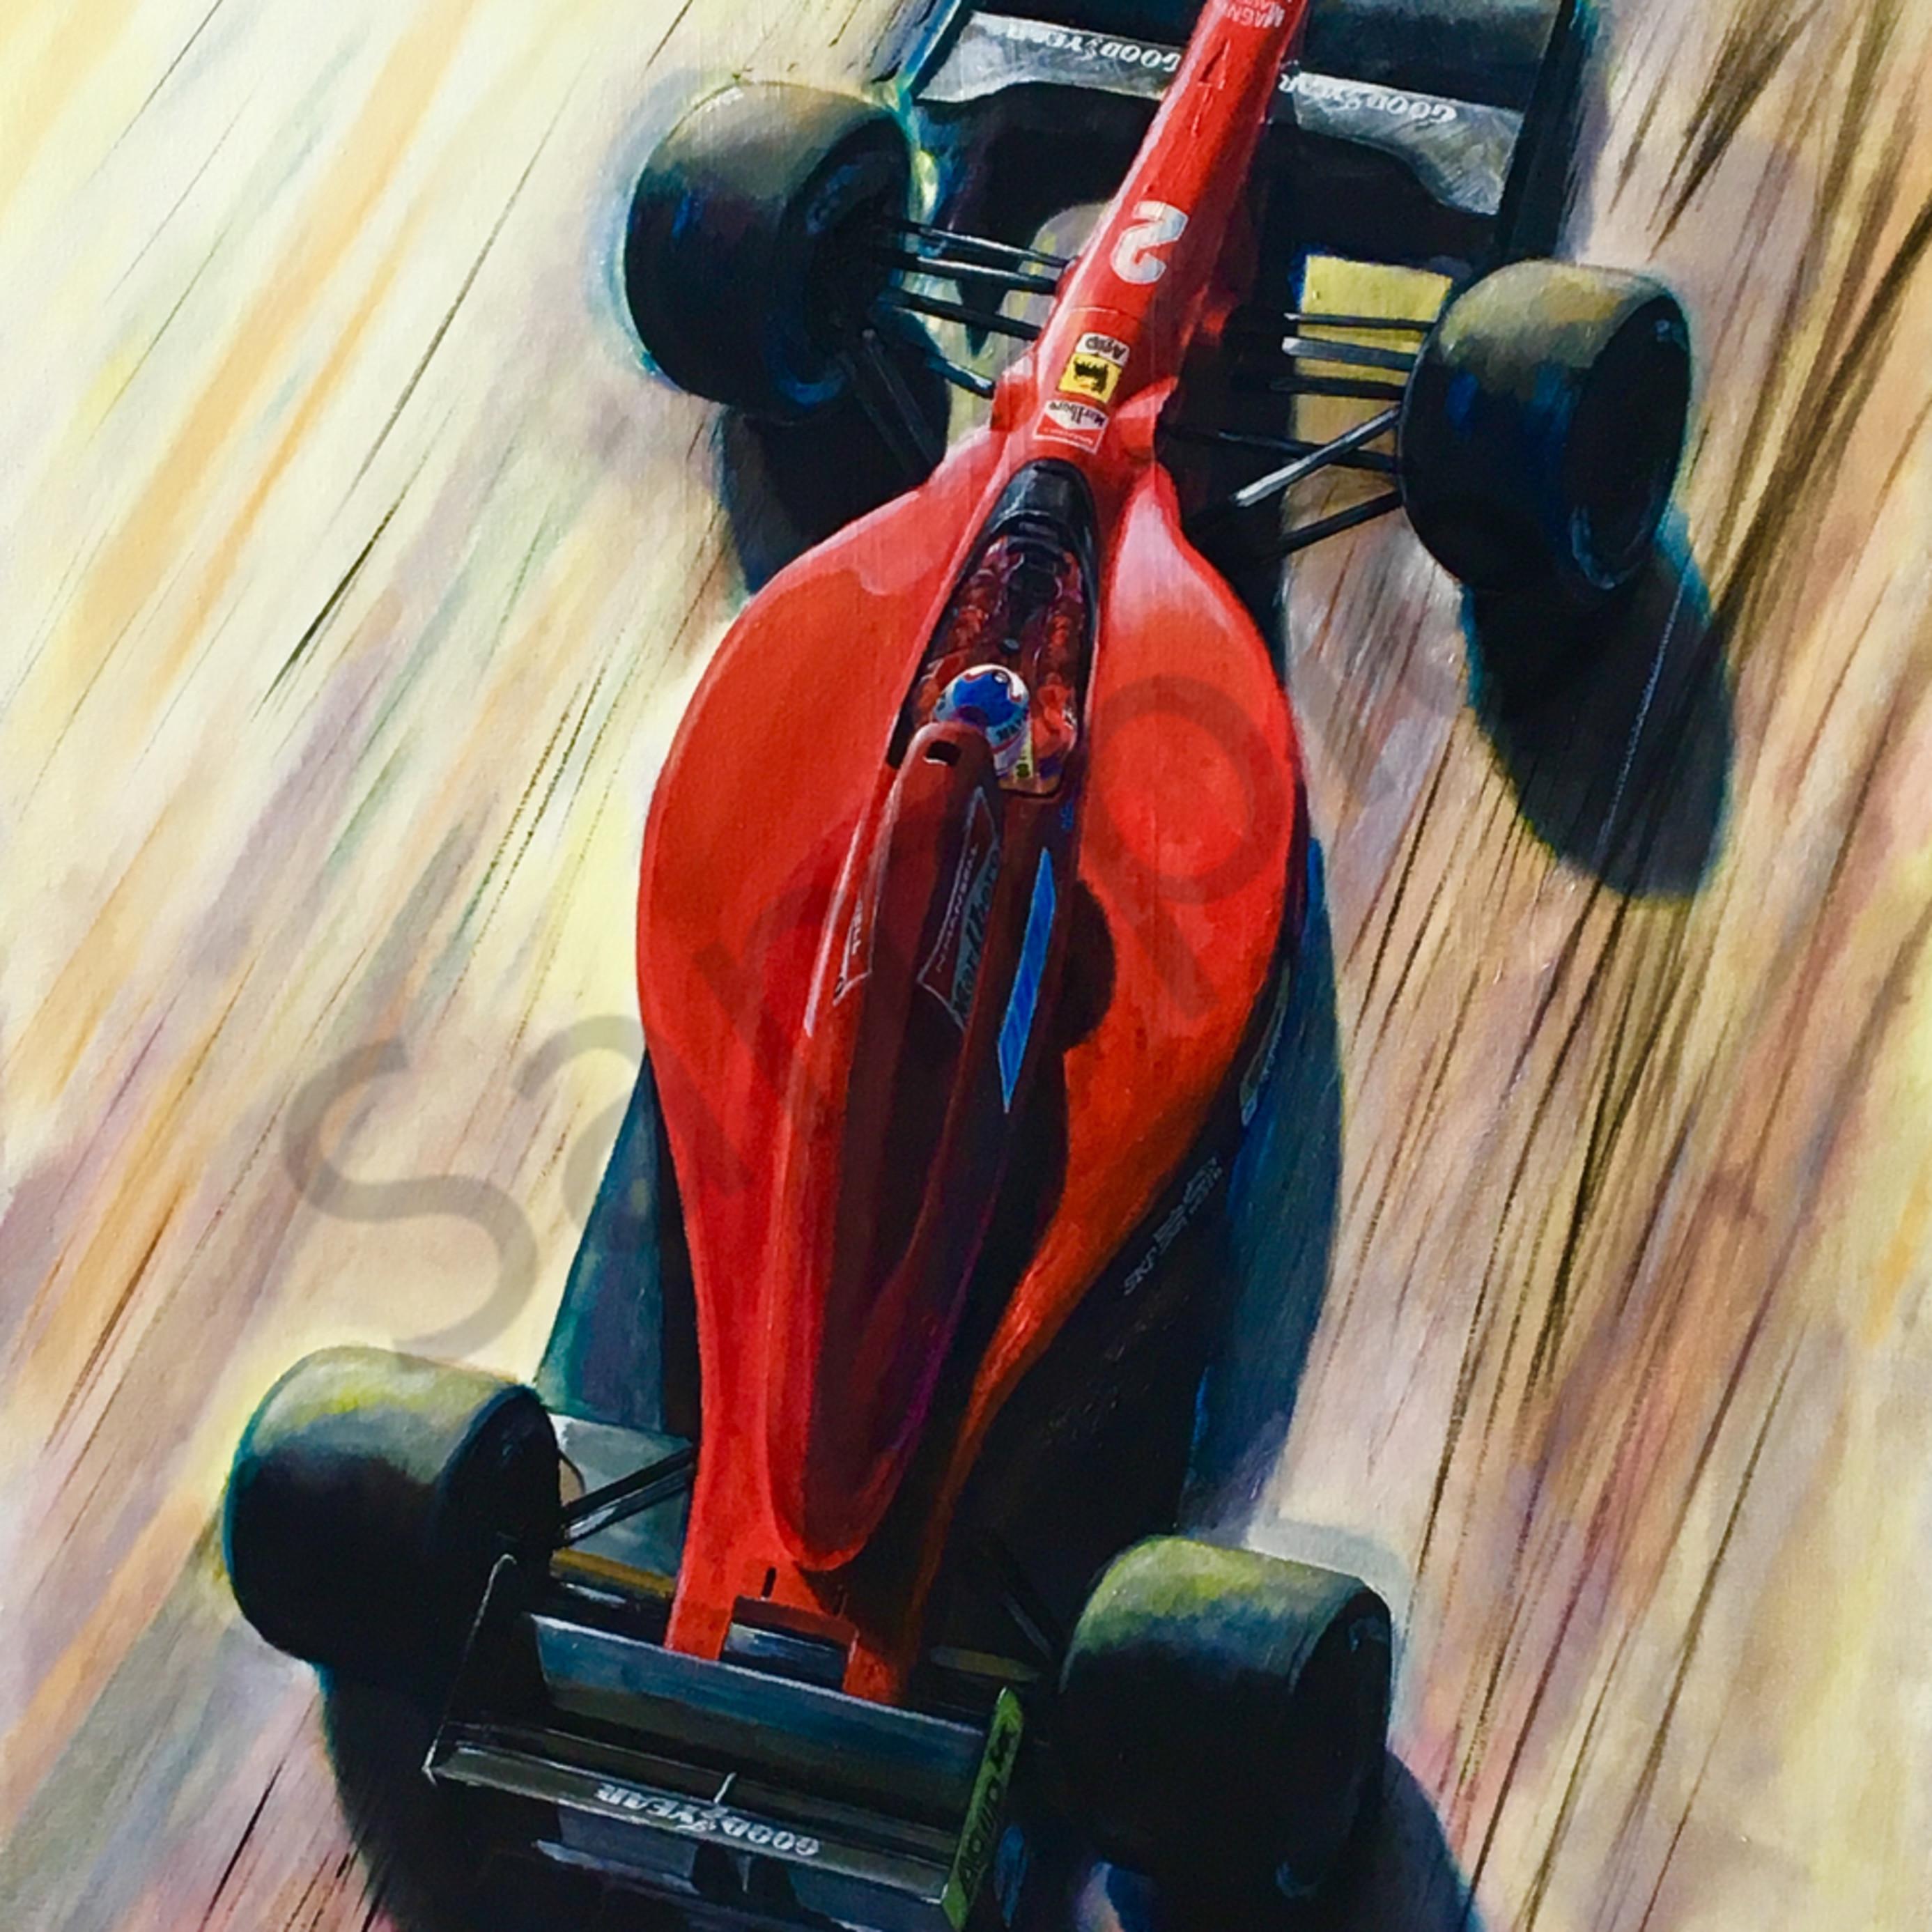 Mansellf190 l6ff6t